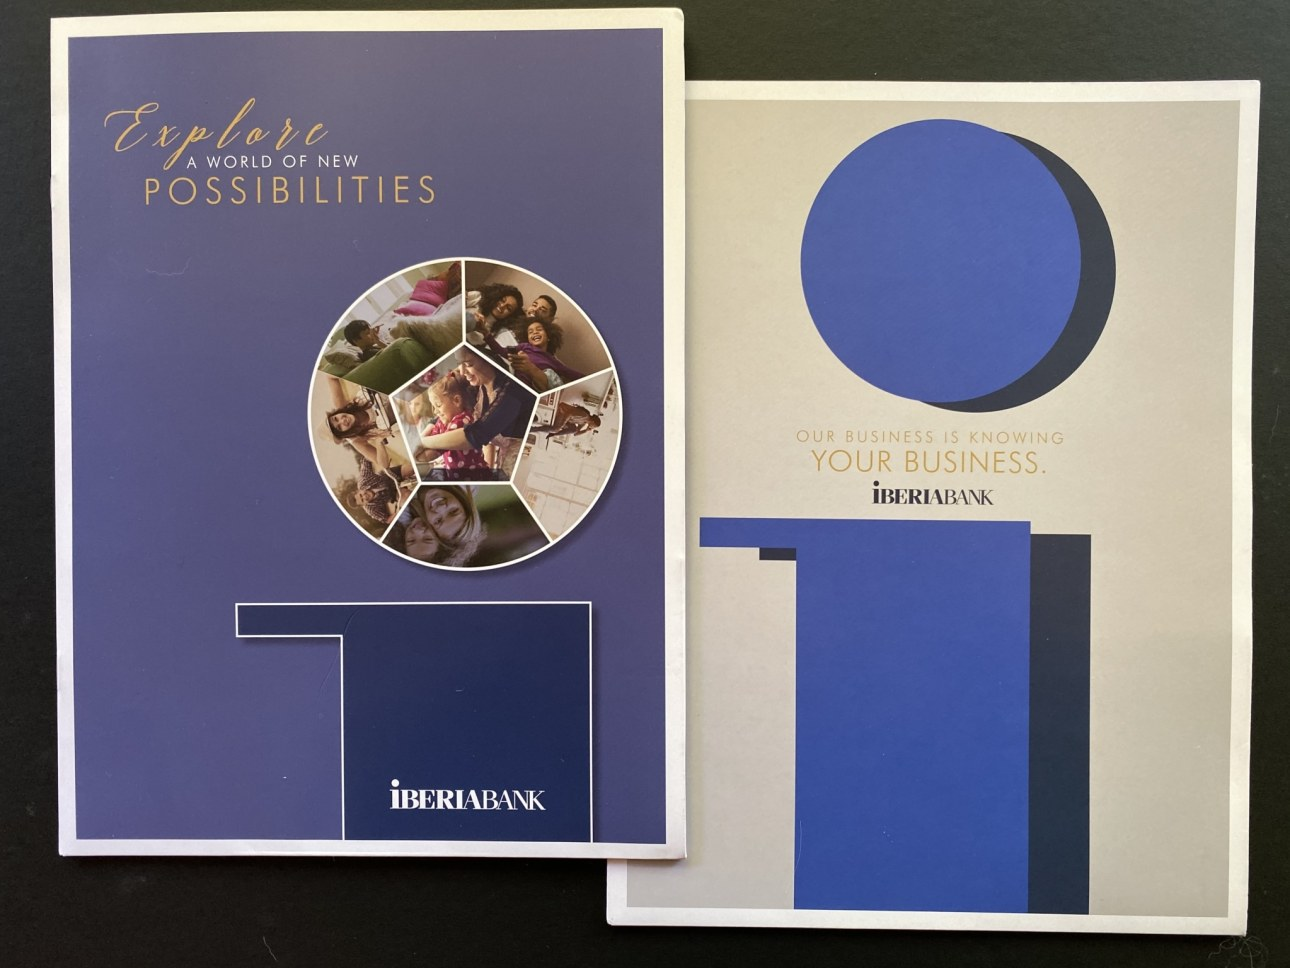 Image of IBERIABANK marketing materials.